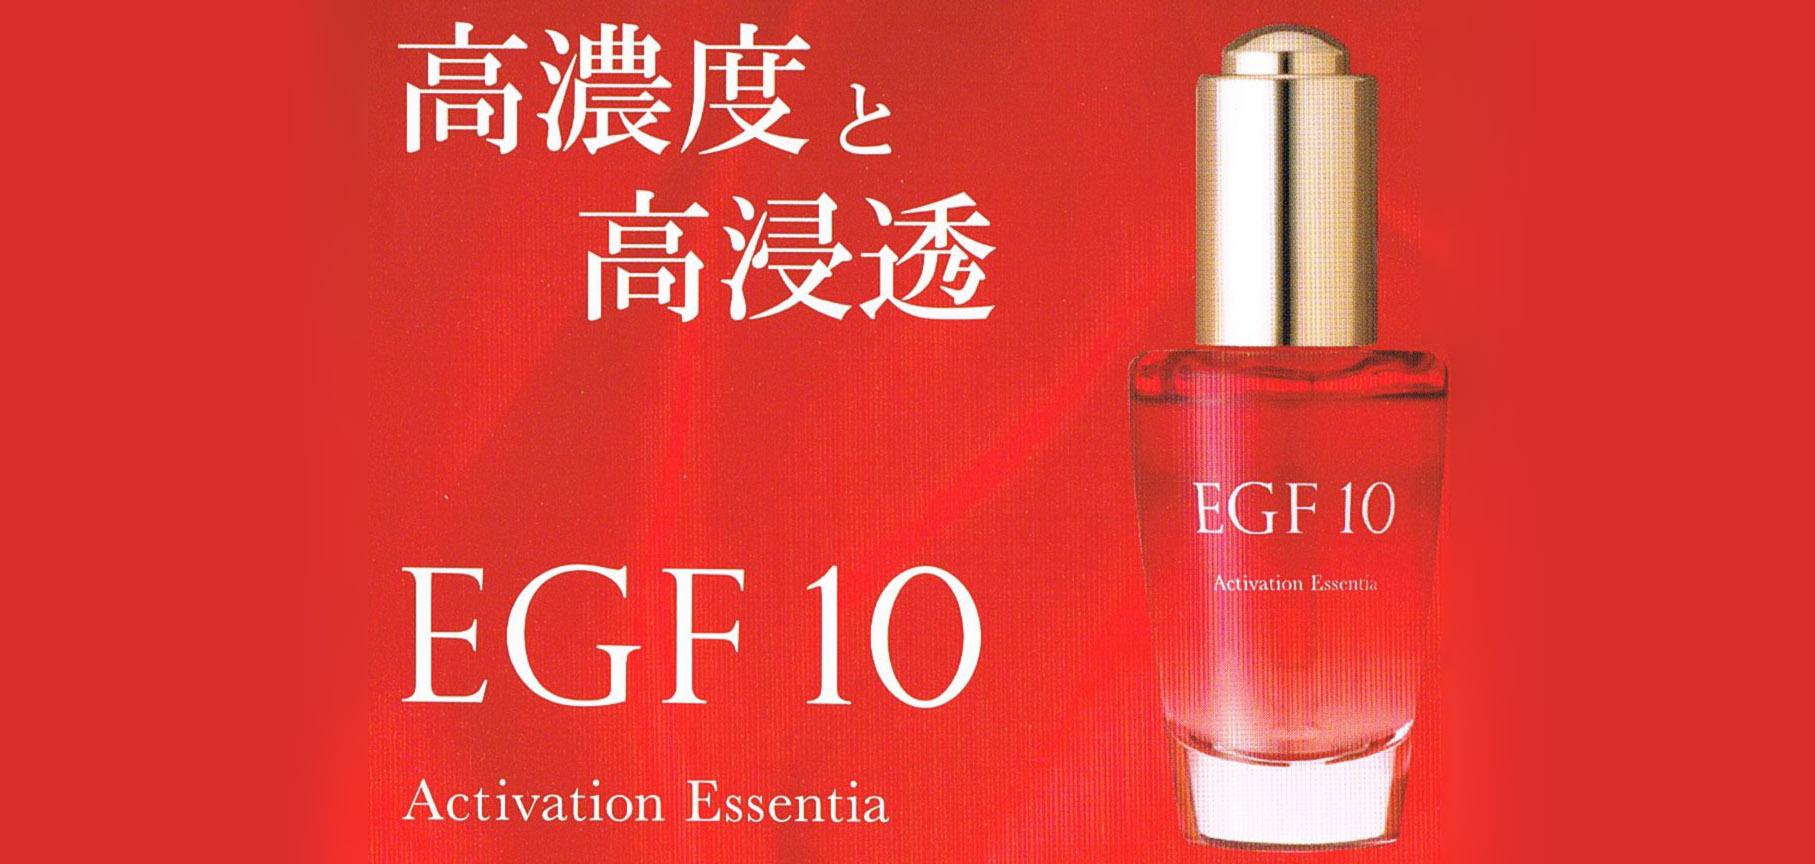 高浸透美容液 EGF10